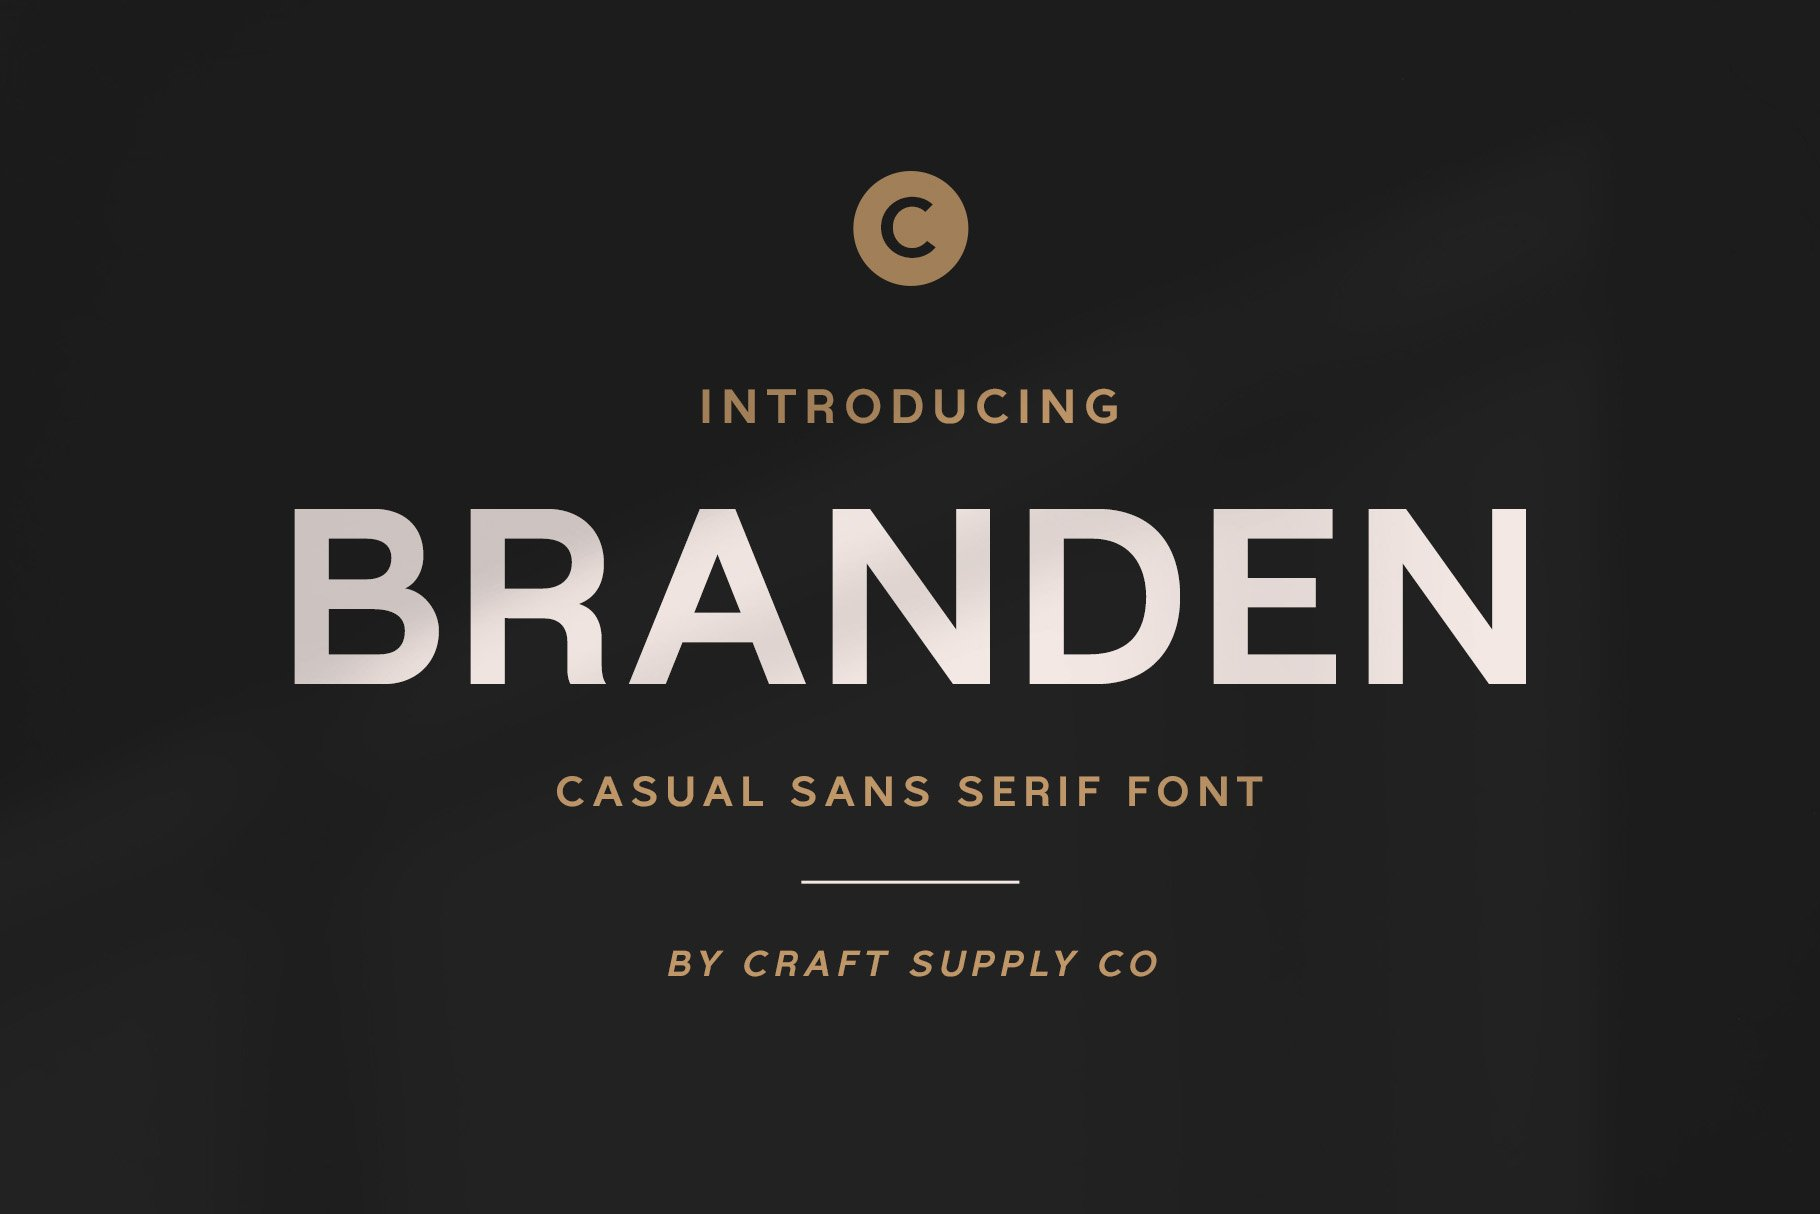 Branden - Casual Sans Serif Font example image 1